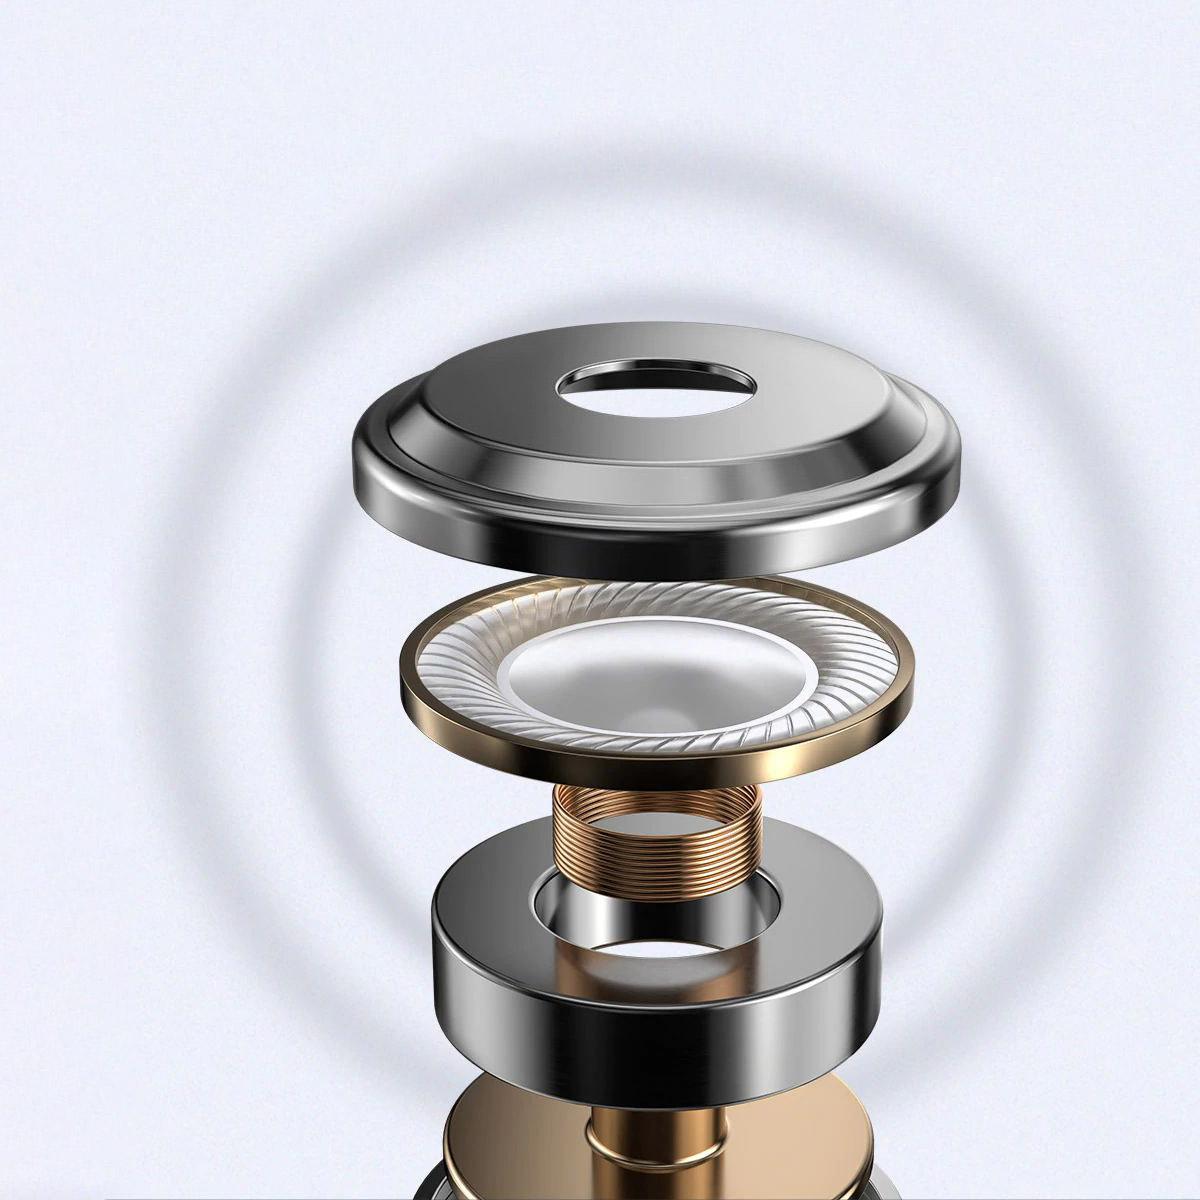 Haylou GT3 7.2mm Dynamic Coil Unit